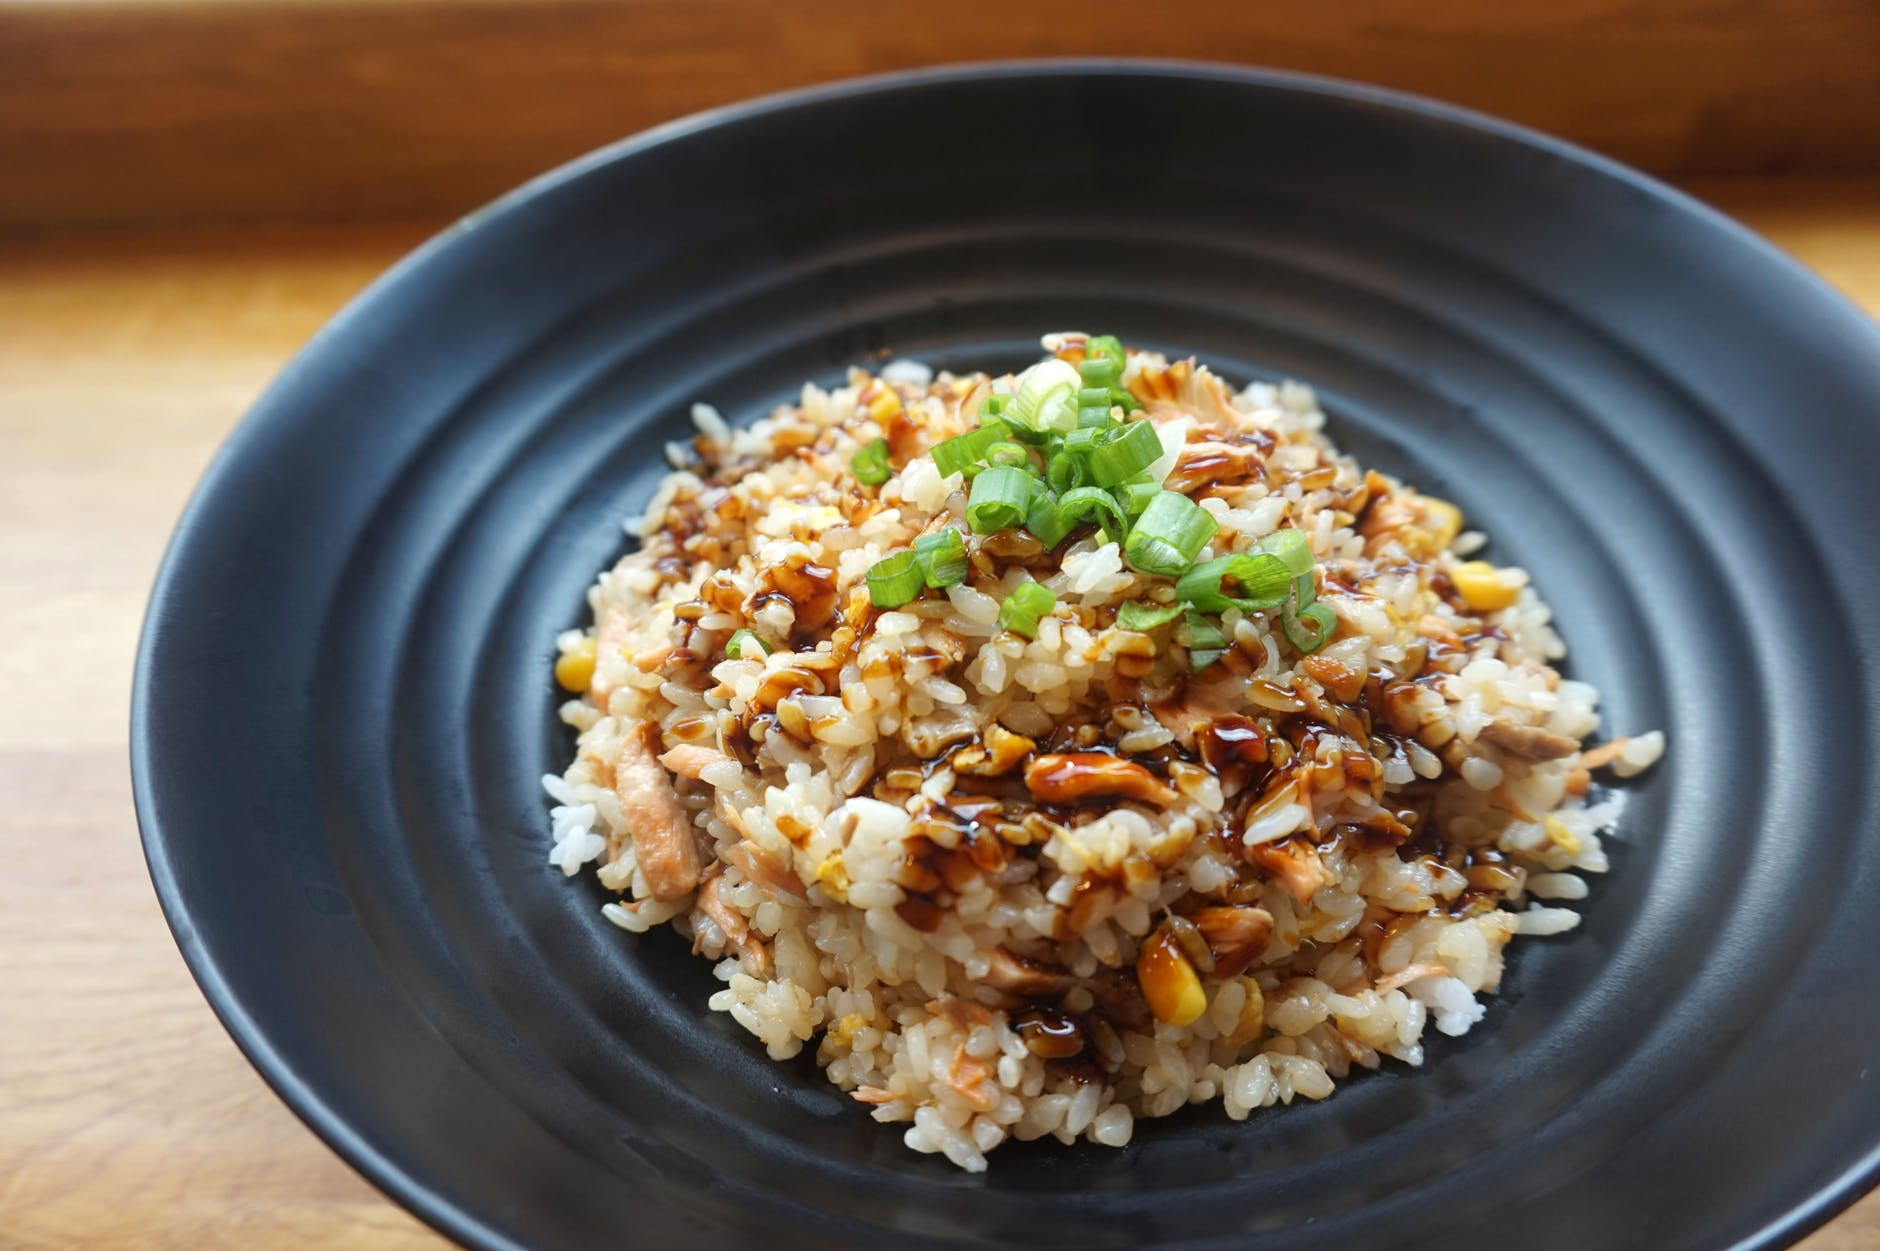 white rice vs brown rice